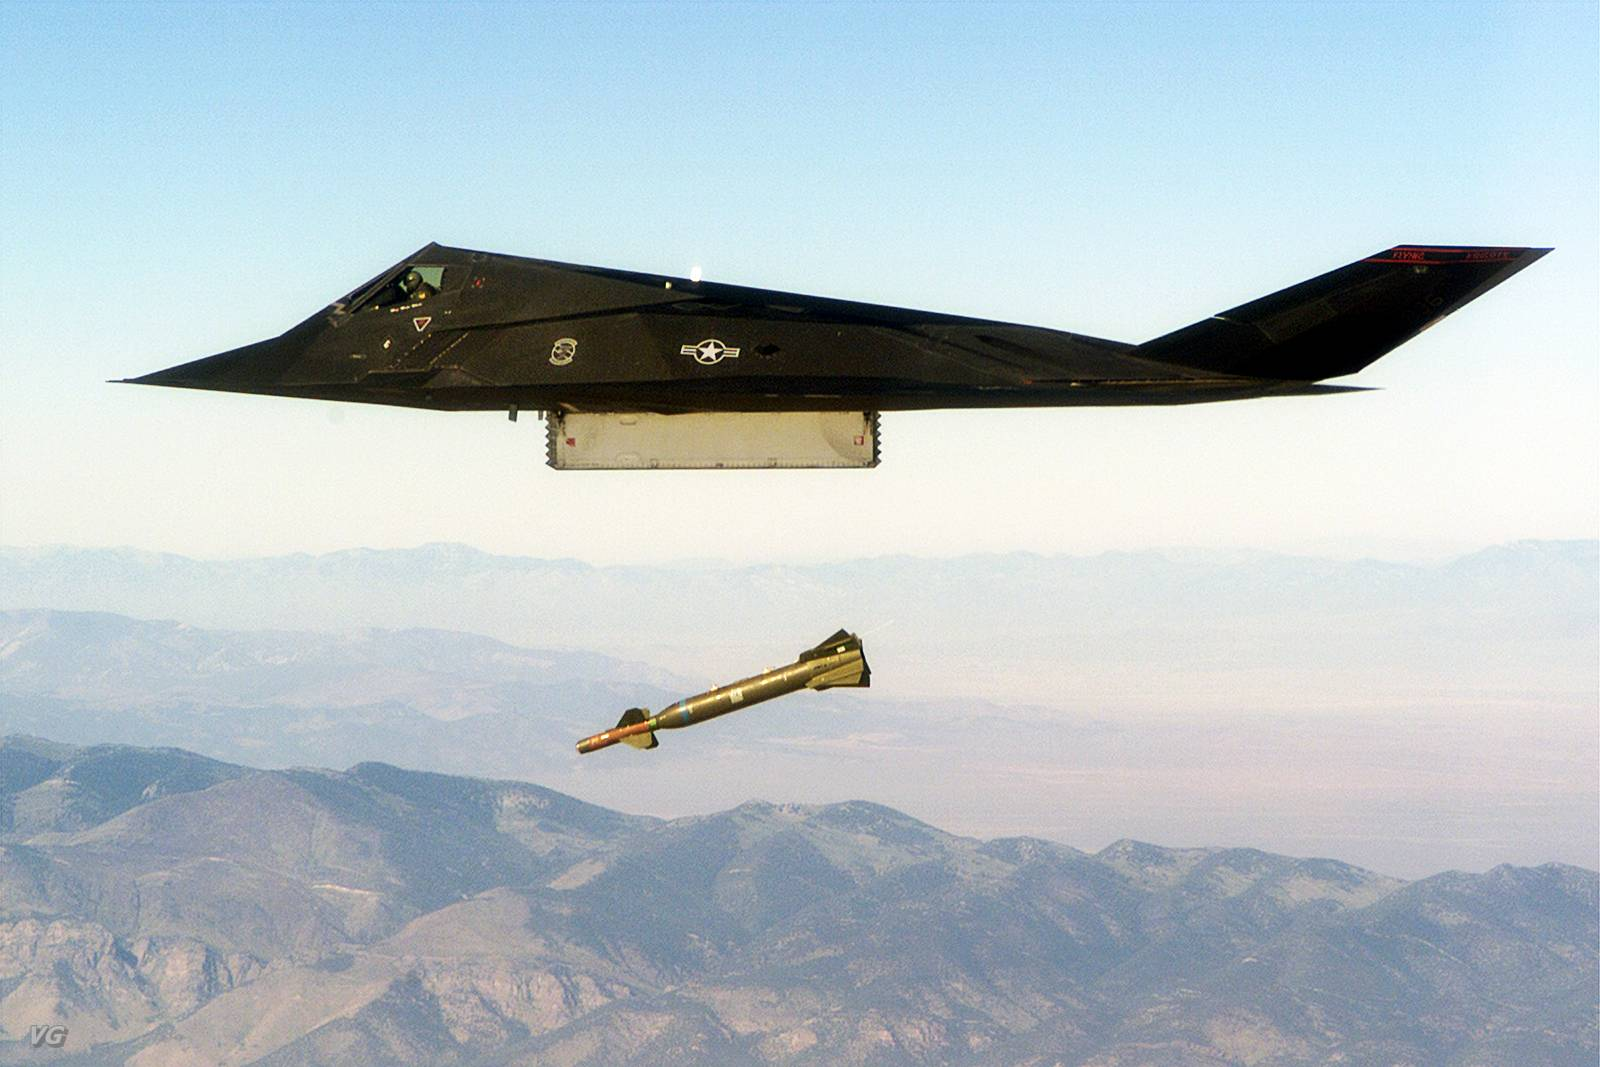 O F-117 Nighthawk - Poder Aéreo - Forças Aéreas, Indústria ...